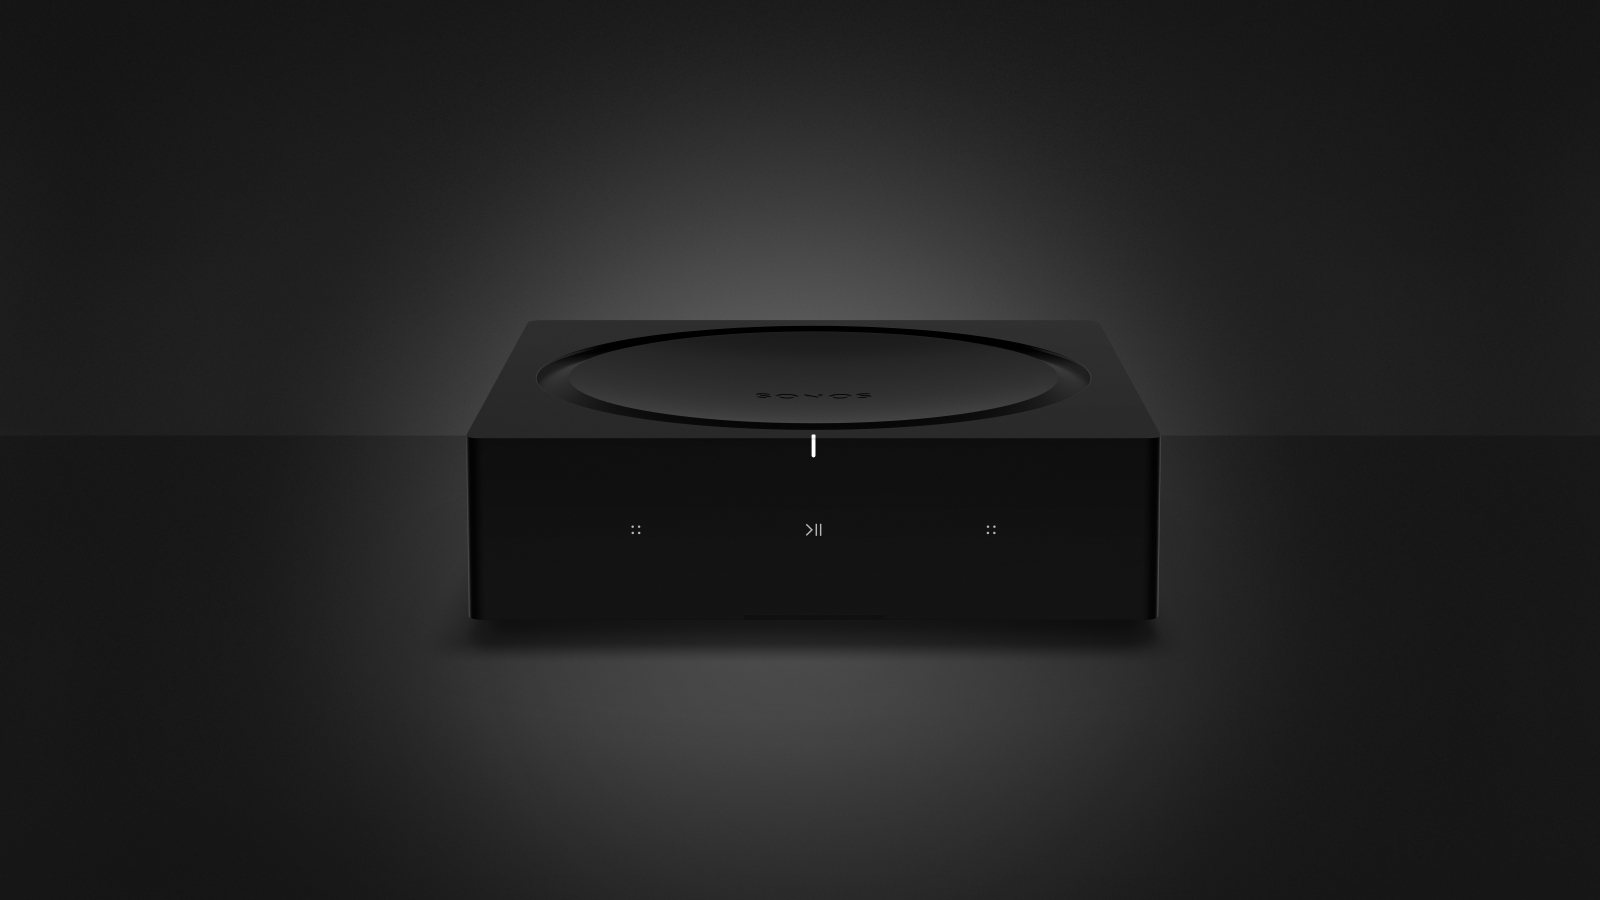 Sonos lancia Amp, il nuovo hub per l'home entertainment | IFA 2018 thumbnail